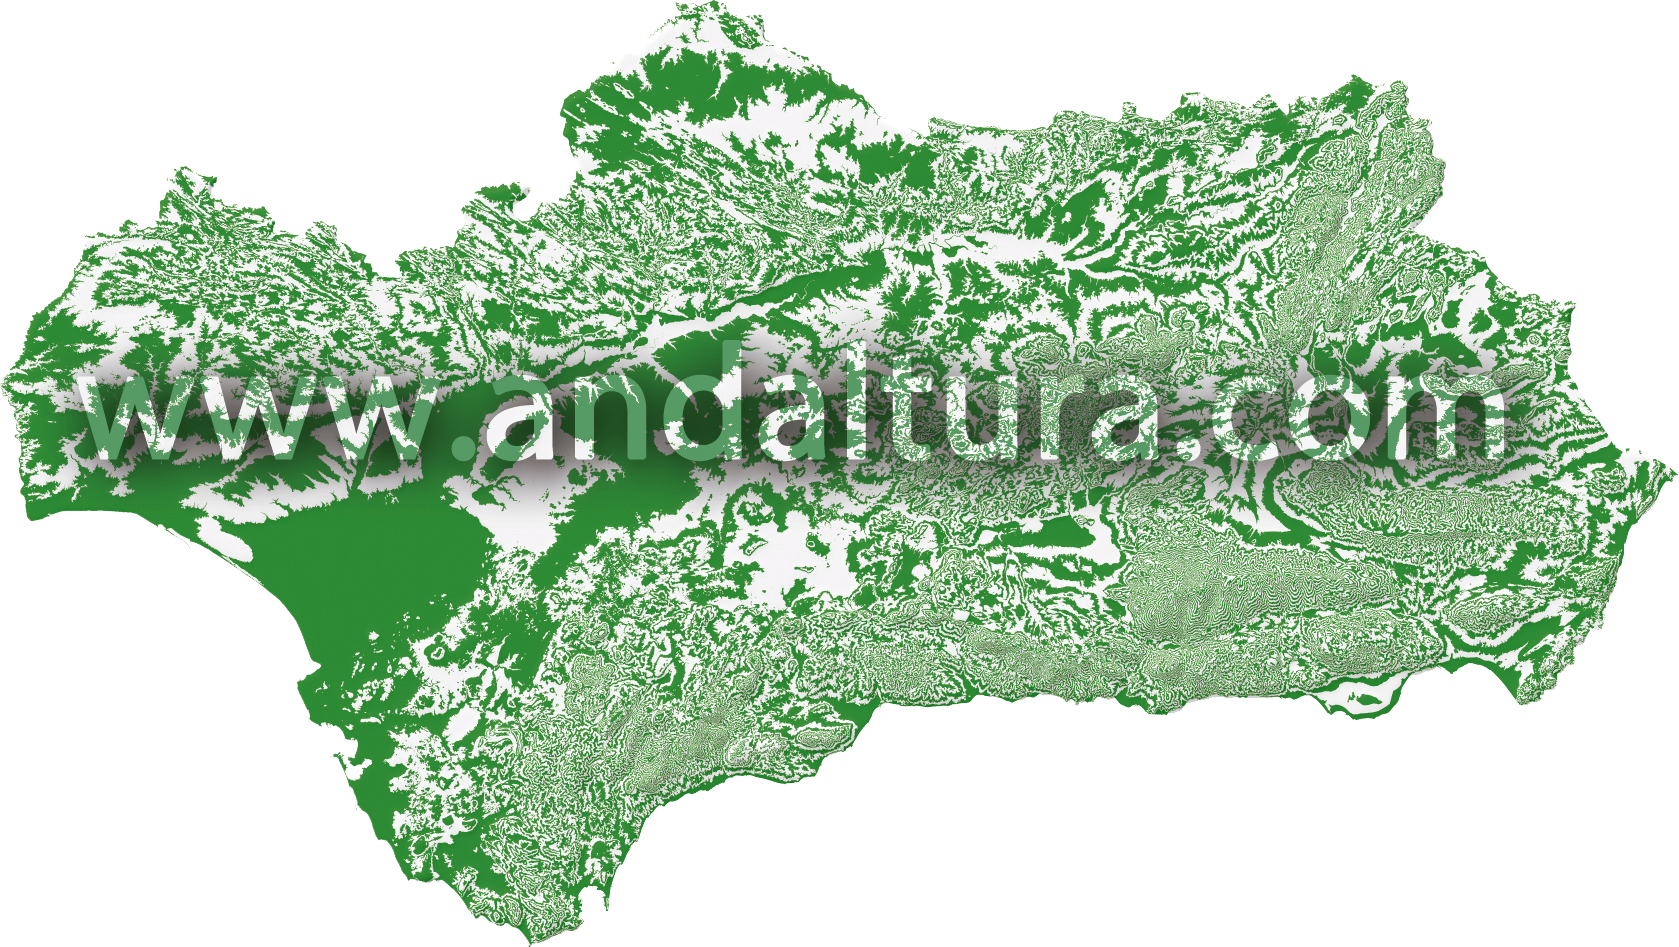 Mapa de Rutas de Senderismo por Andalucía de Andaltura